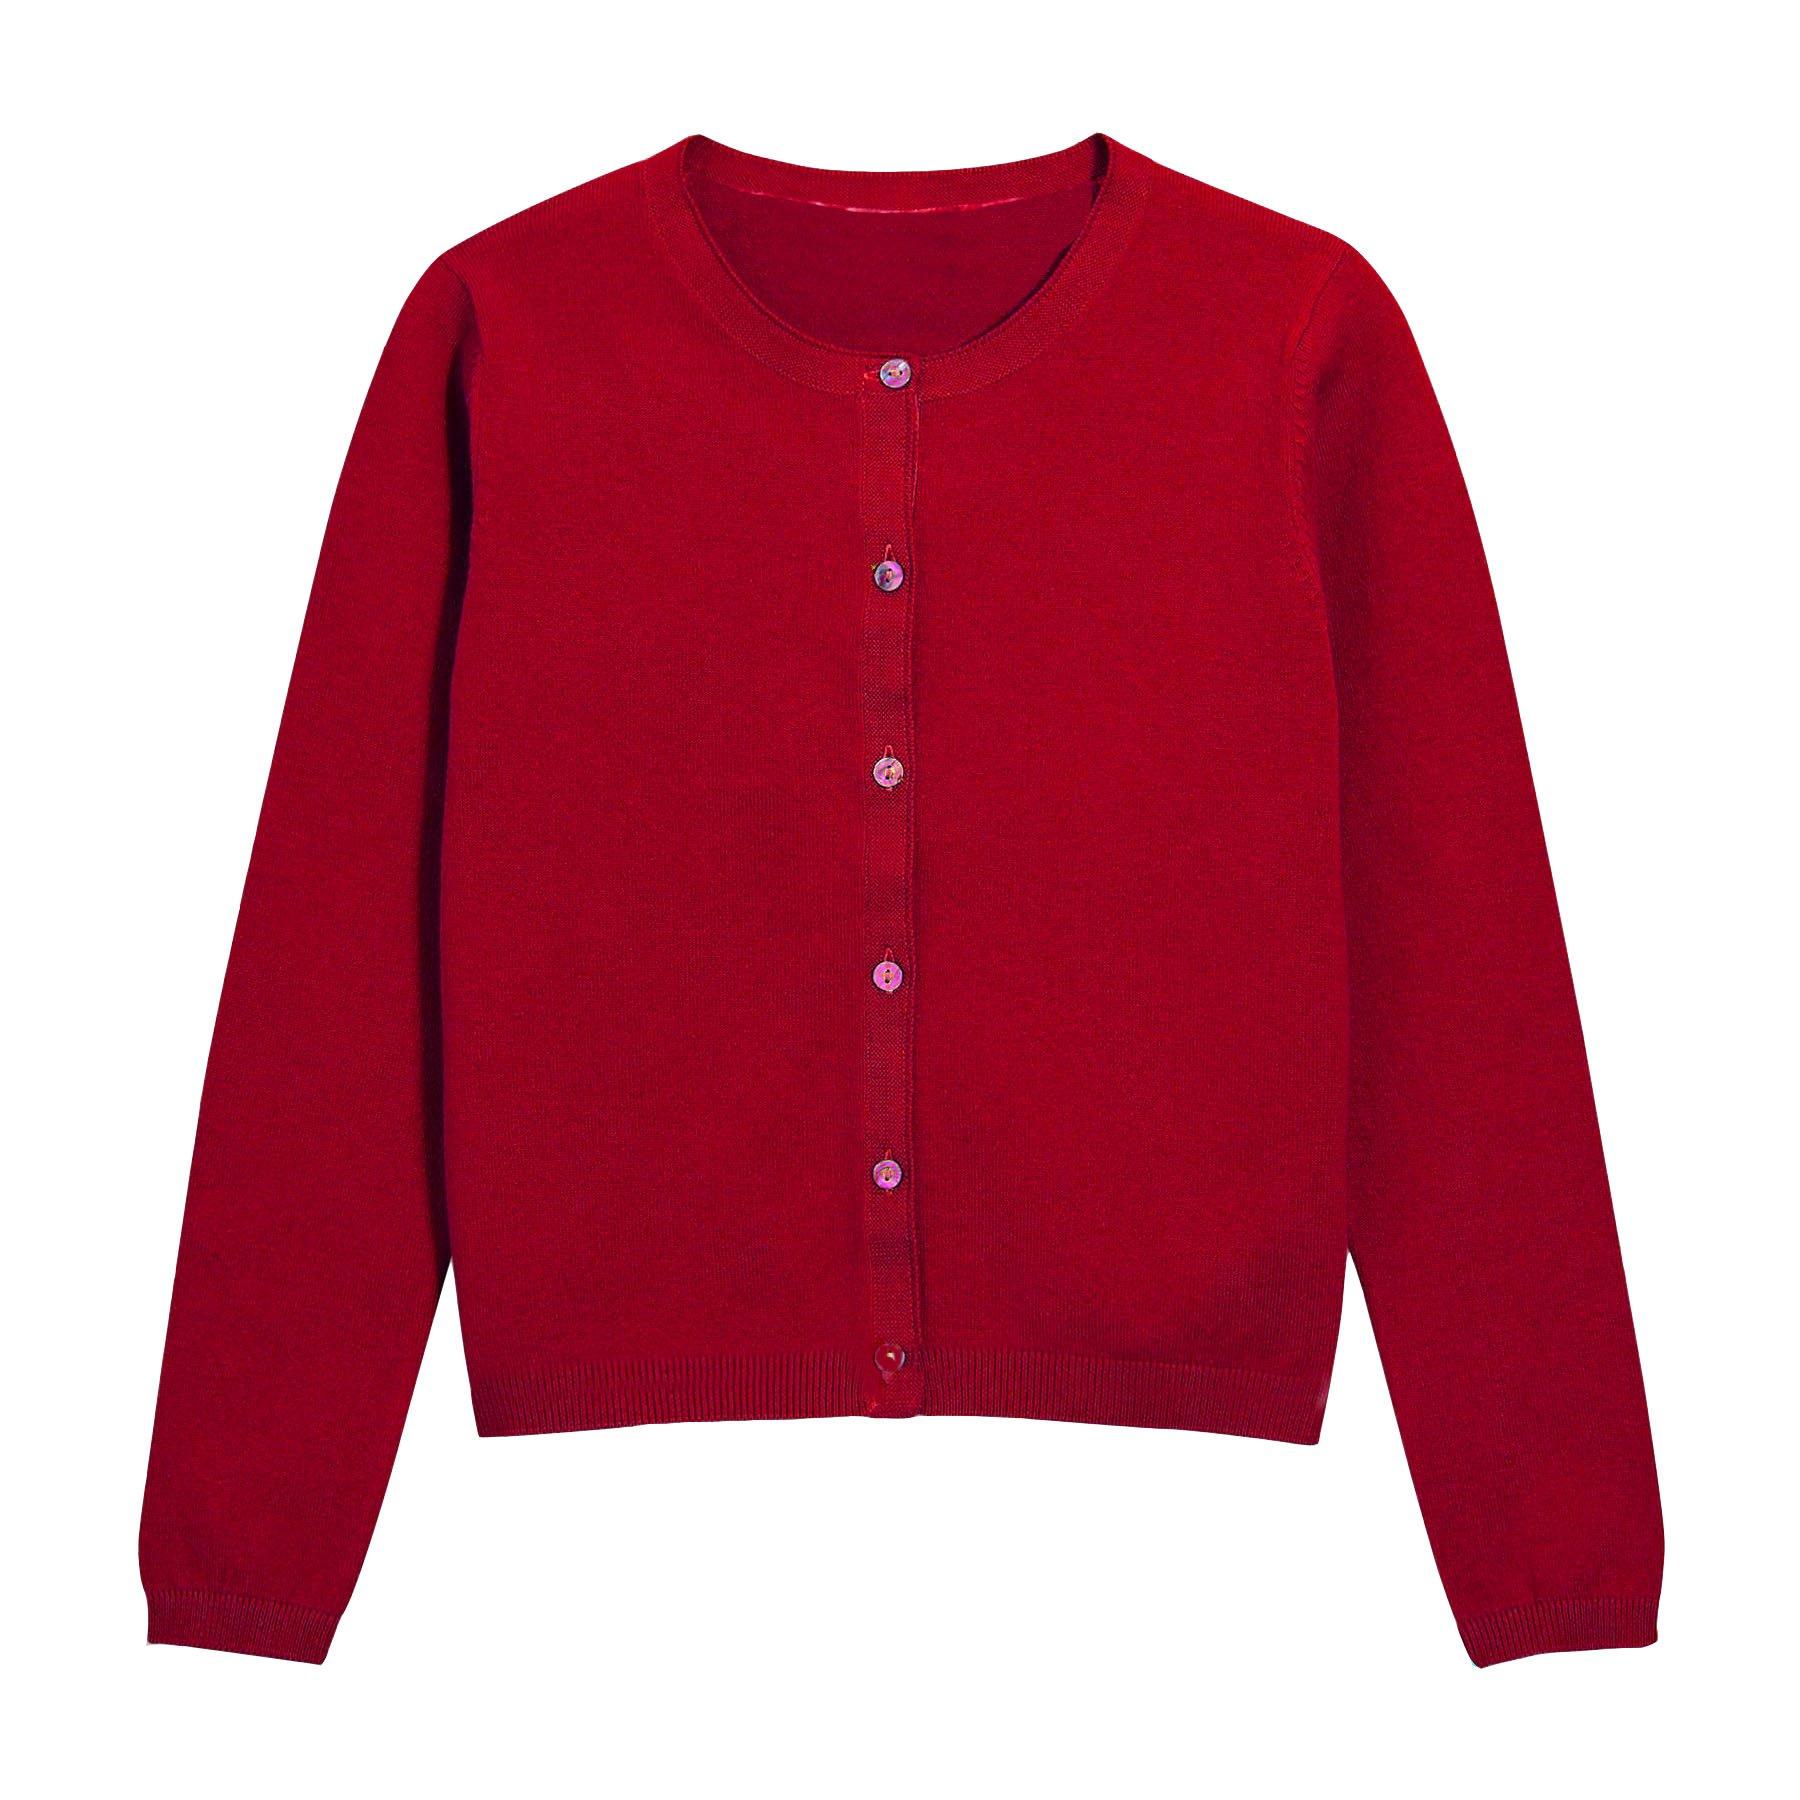 Hollywood Star Fashion Khanomak Kids Girls Crew Neck Cardigan Sweater (Size 5/6, Red)